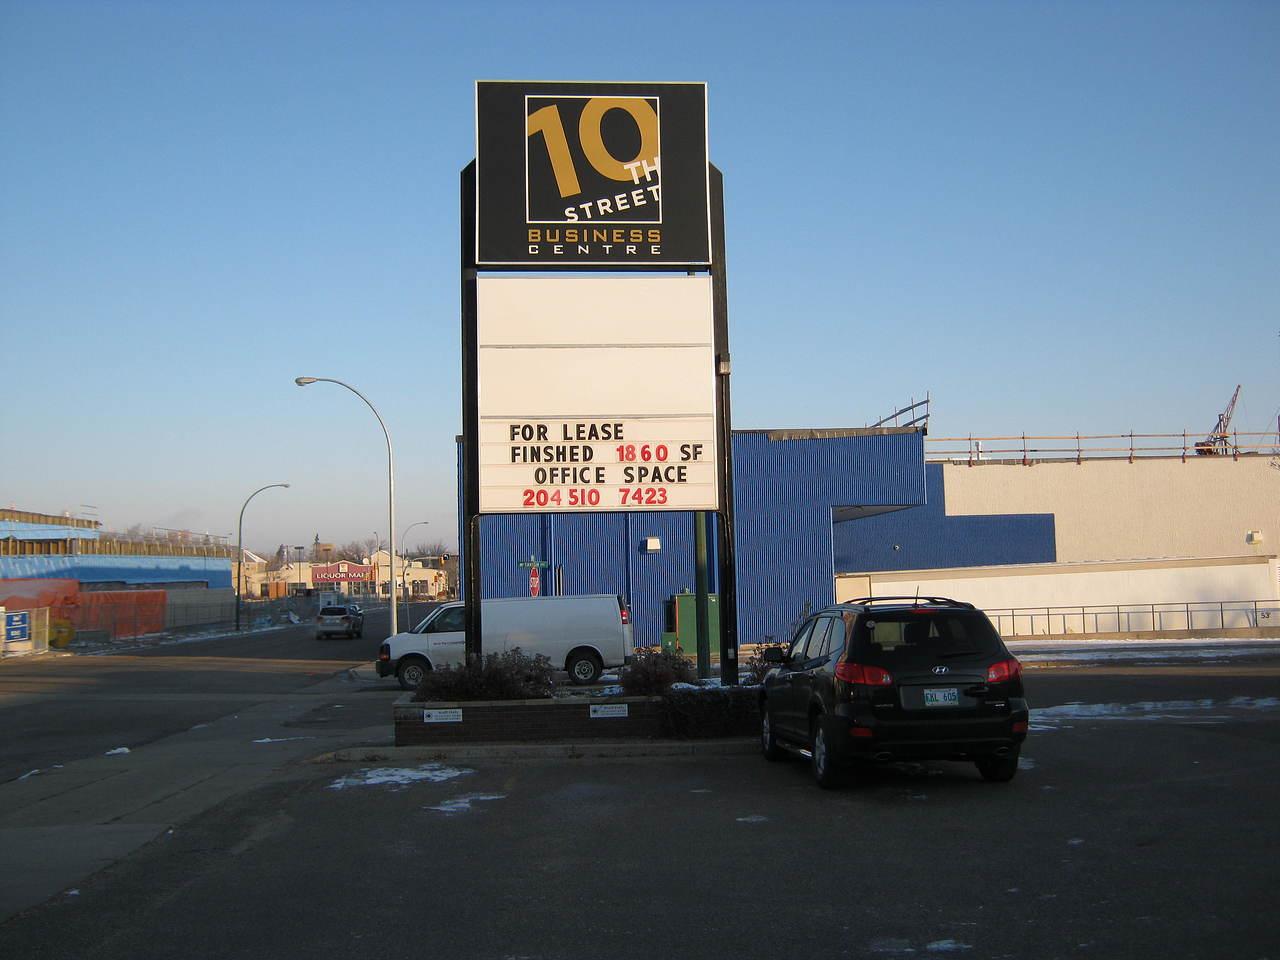 10th street business centre pylon